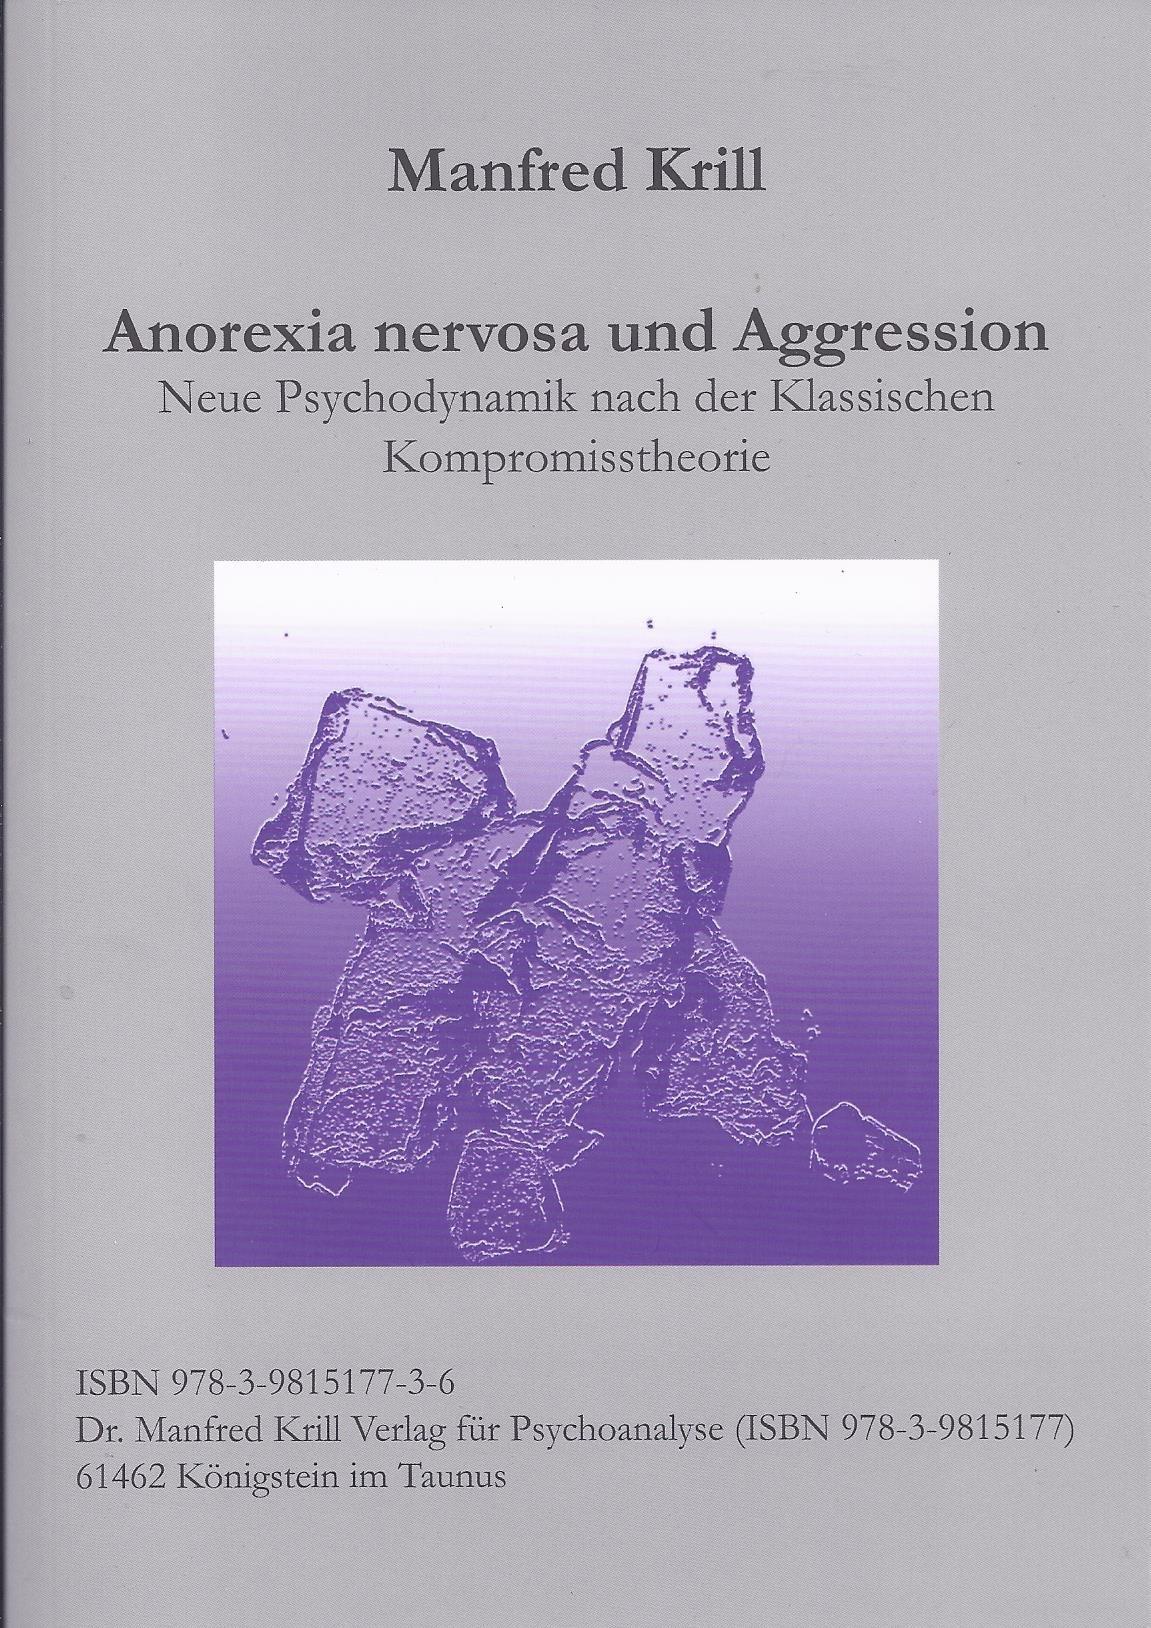 Anorexia nervosa und Aggression